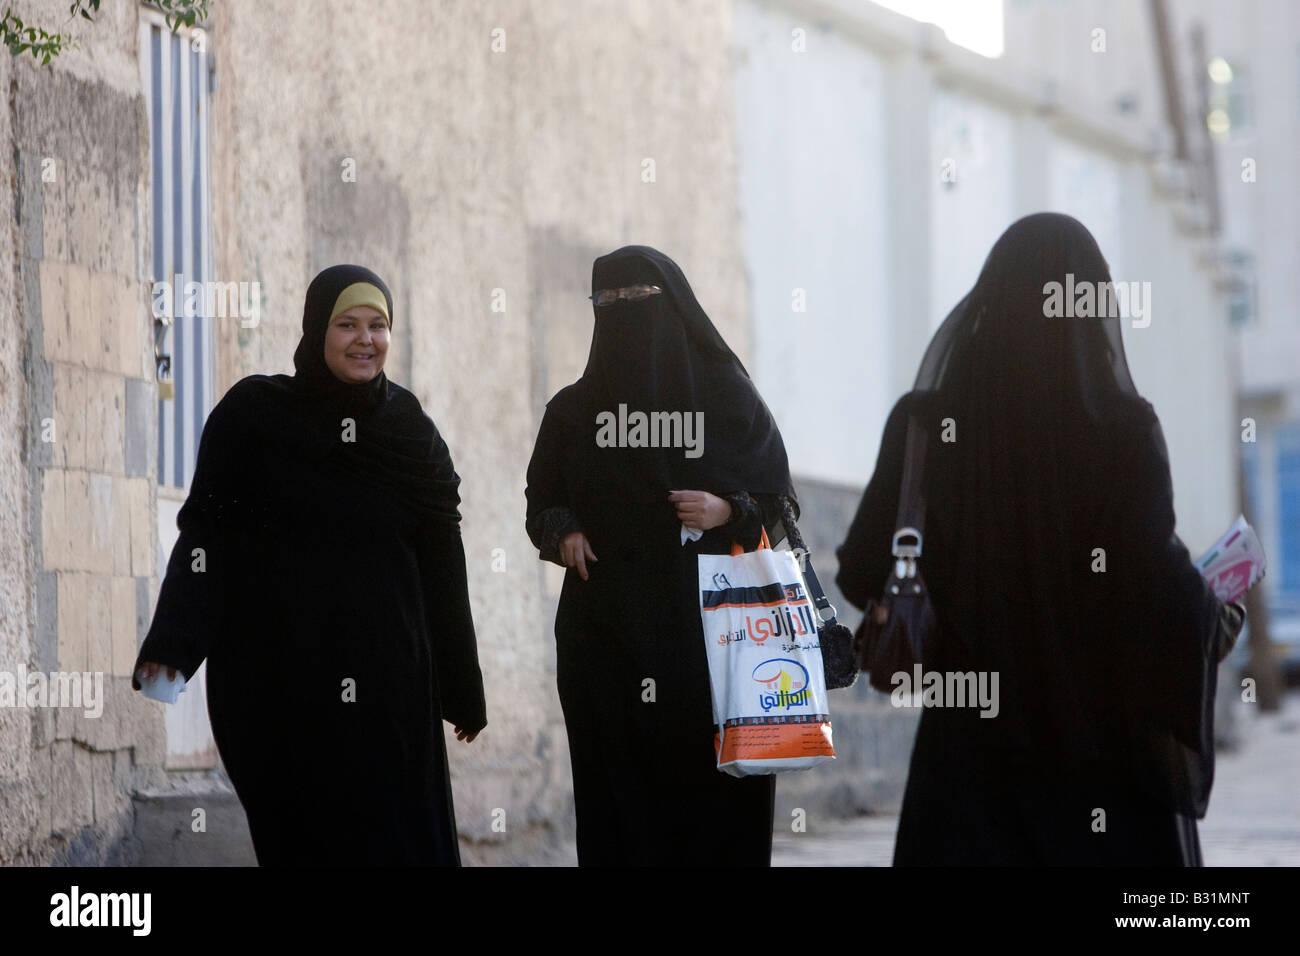 Muslim women wearing Niqab and Chador - Stock Image